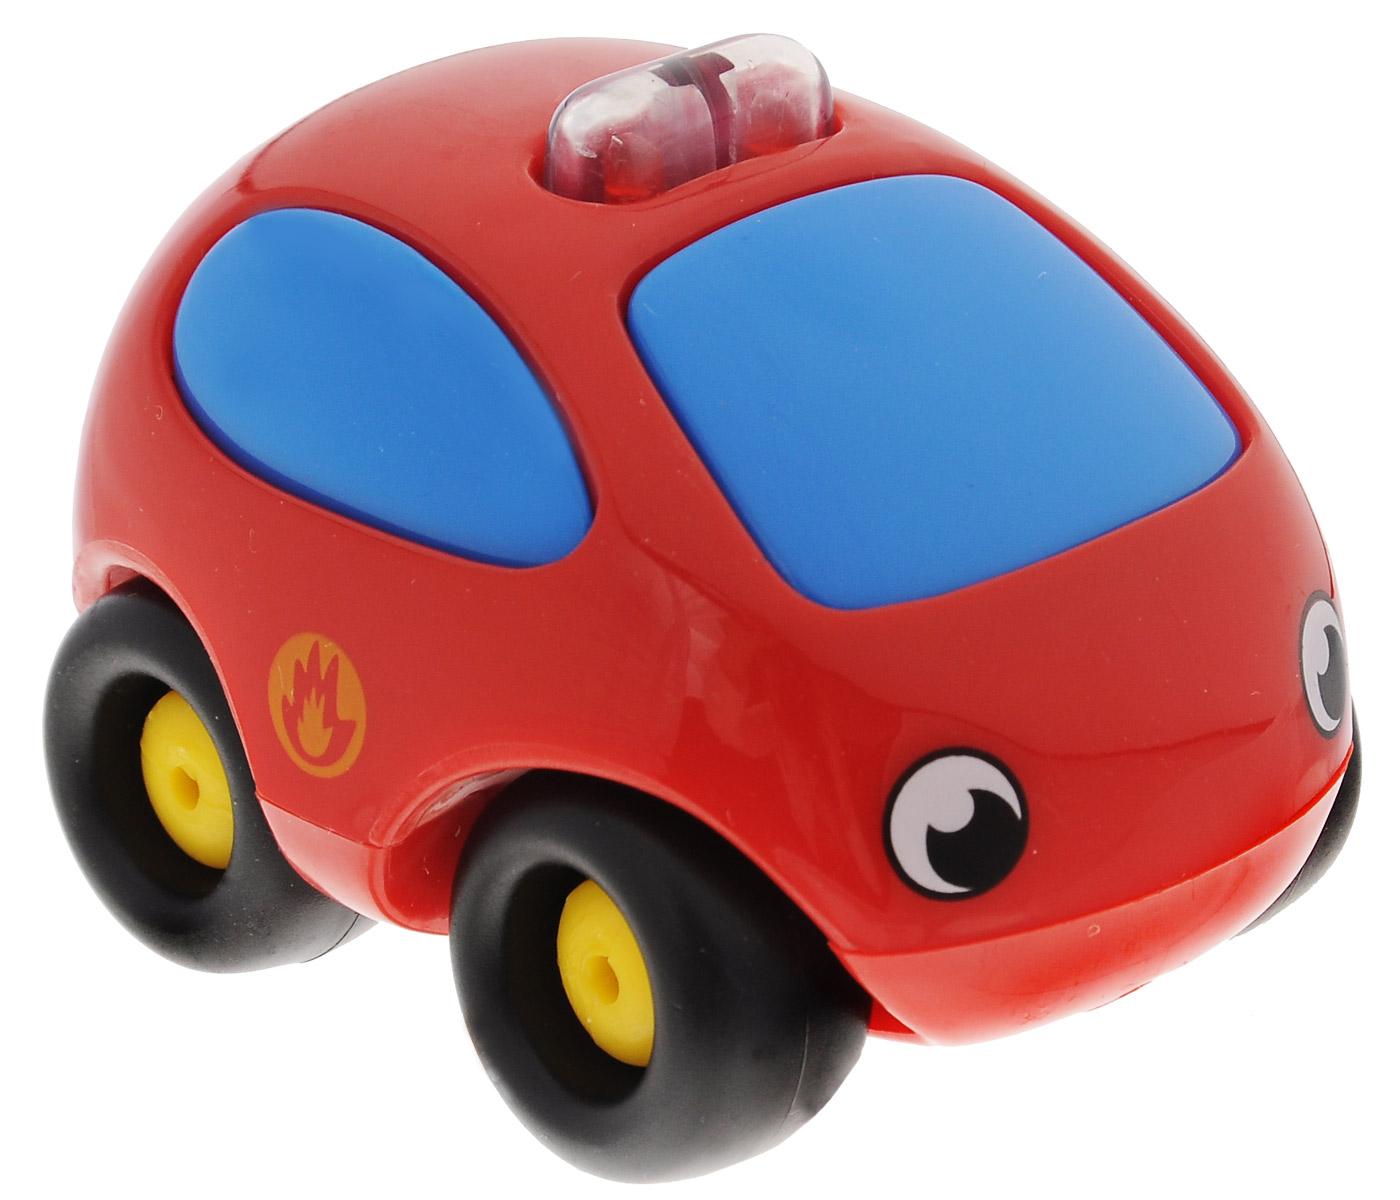 Smoby Машинка Vroom Planet цвет красный smoby машинка vroom planet цвет фиолетовый